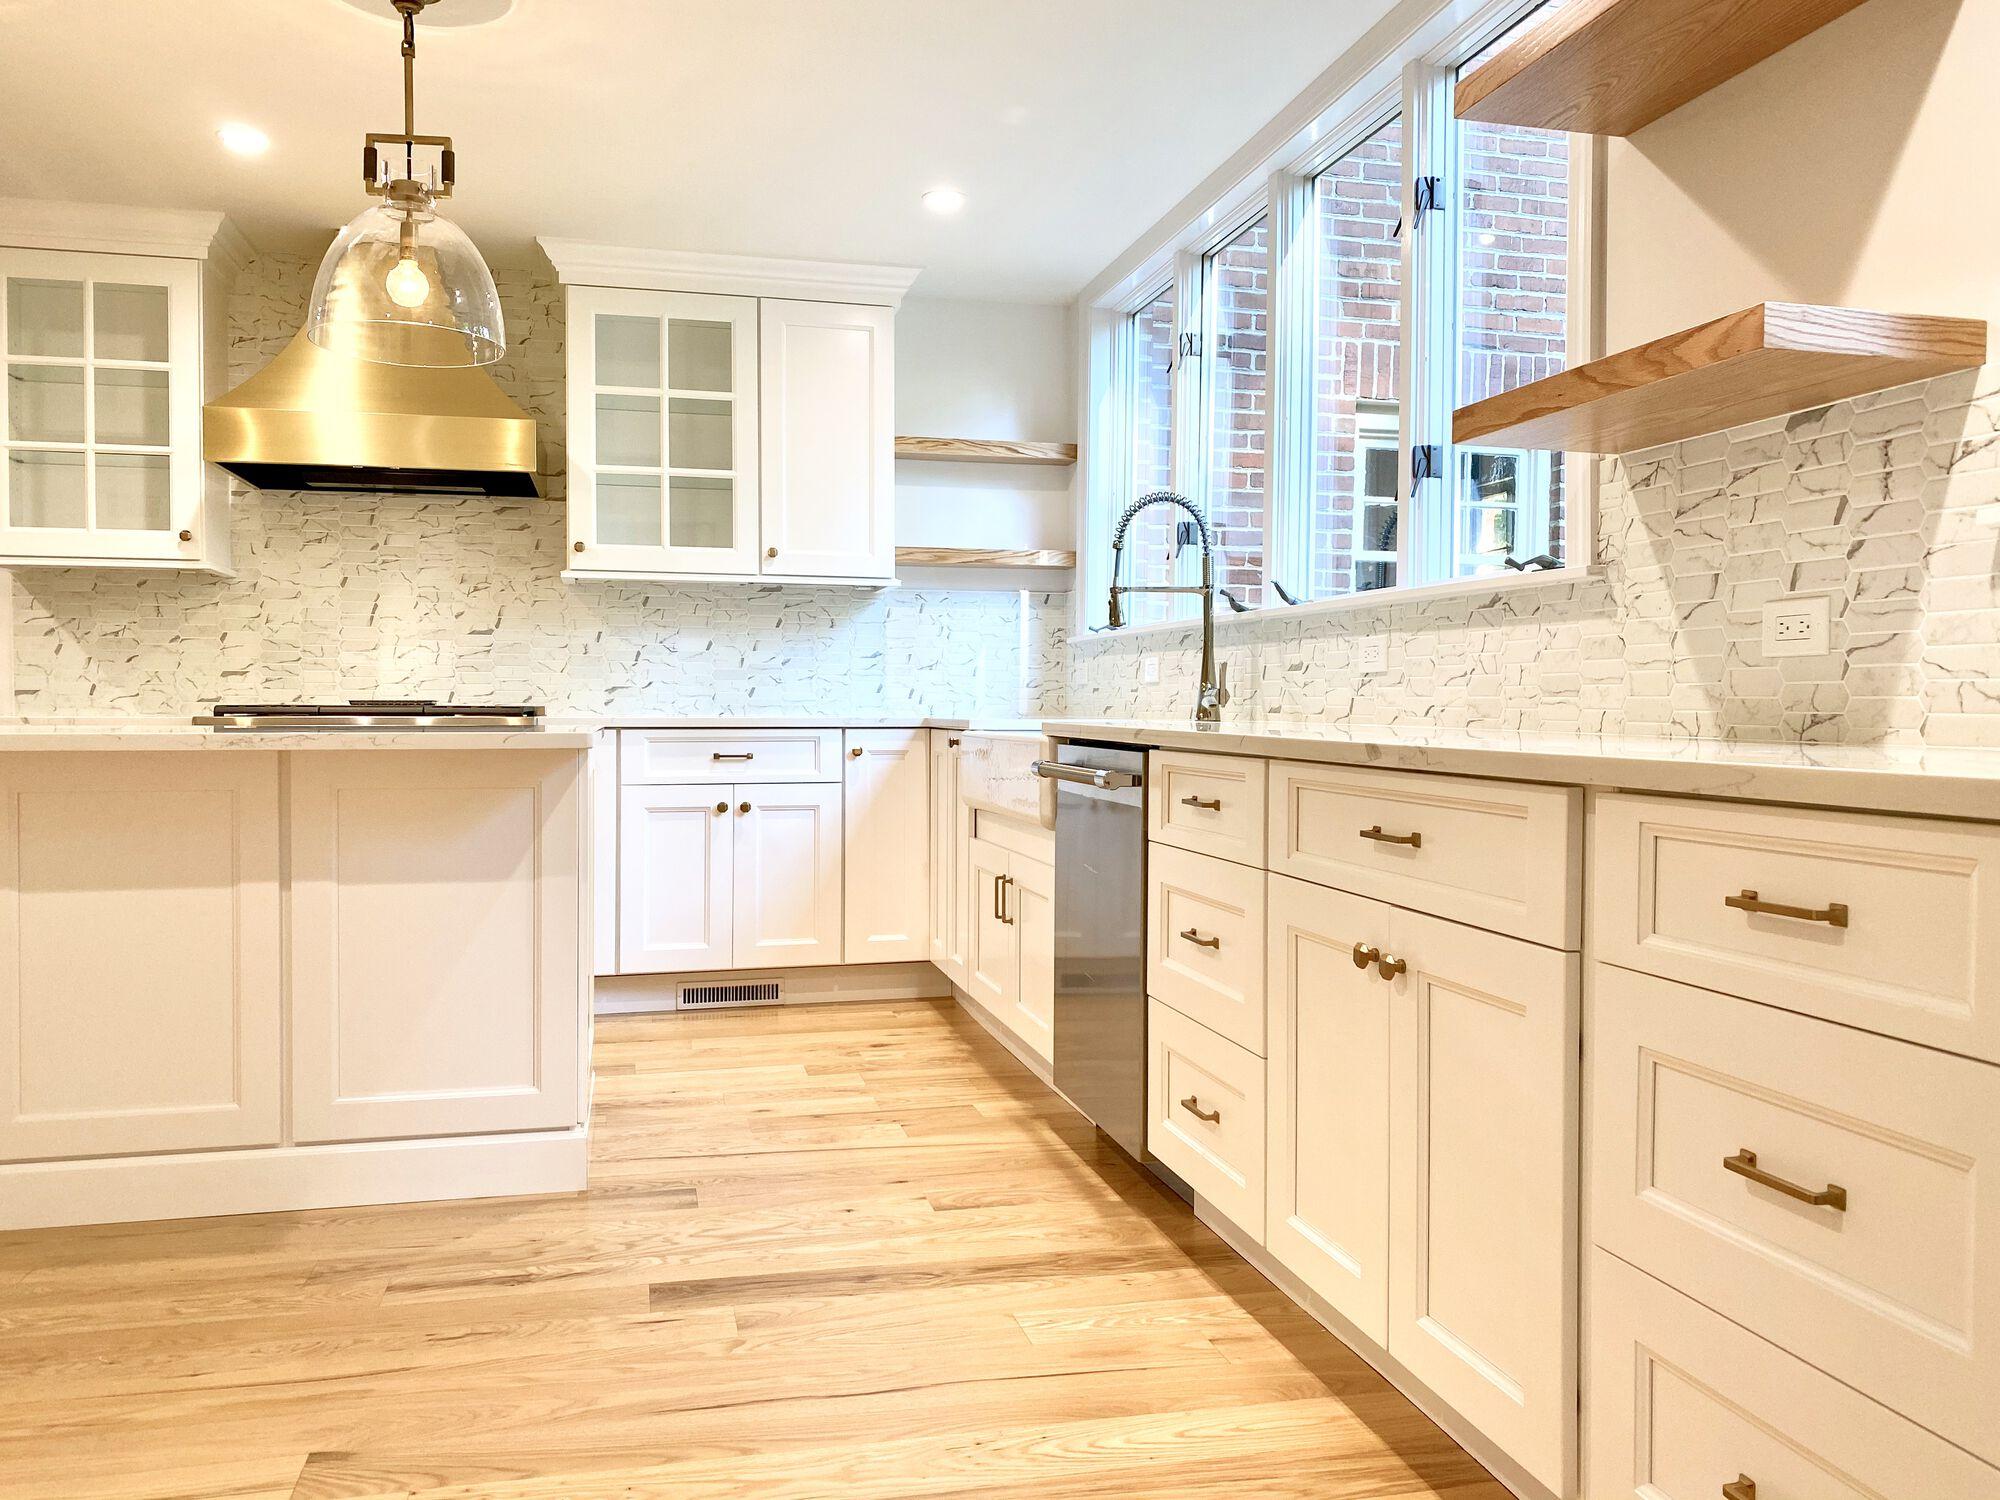 Fabuwood Kitchen Cabinetry with Floating Shelves, Oak Flooring, Quartz Tops in West Orange, Essex County NJ